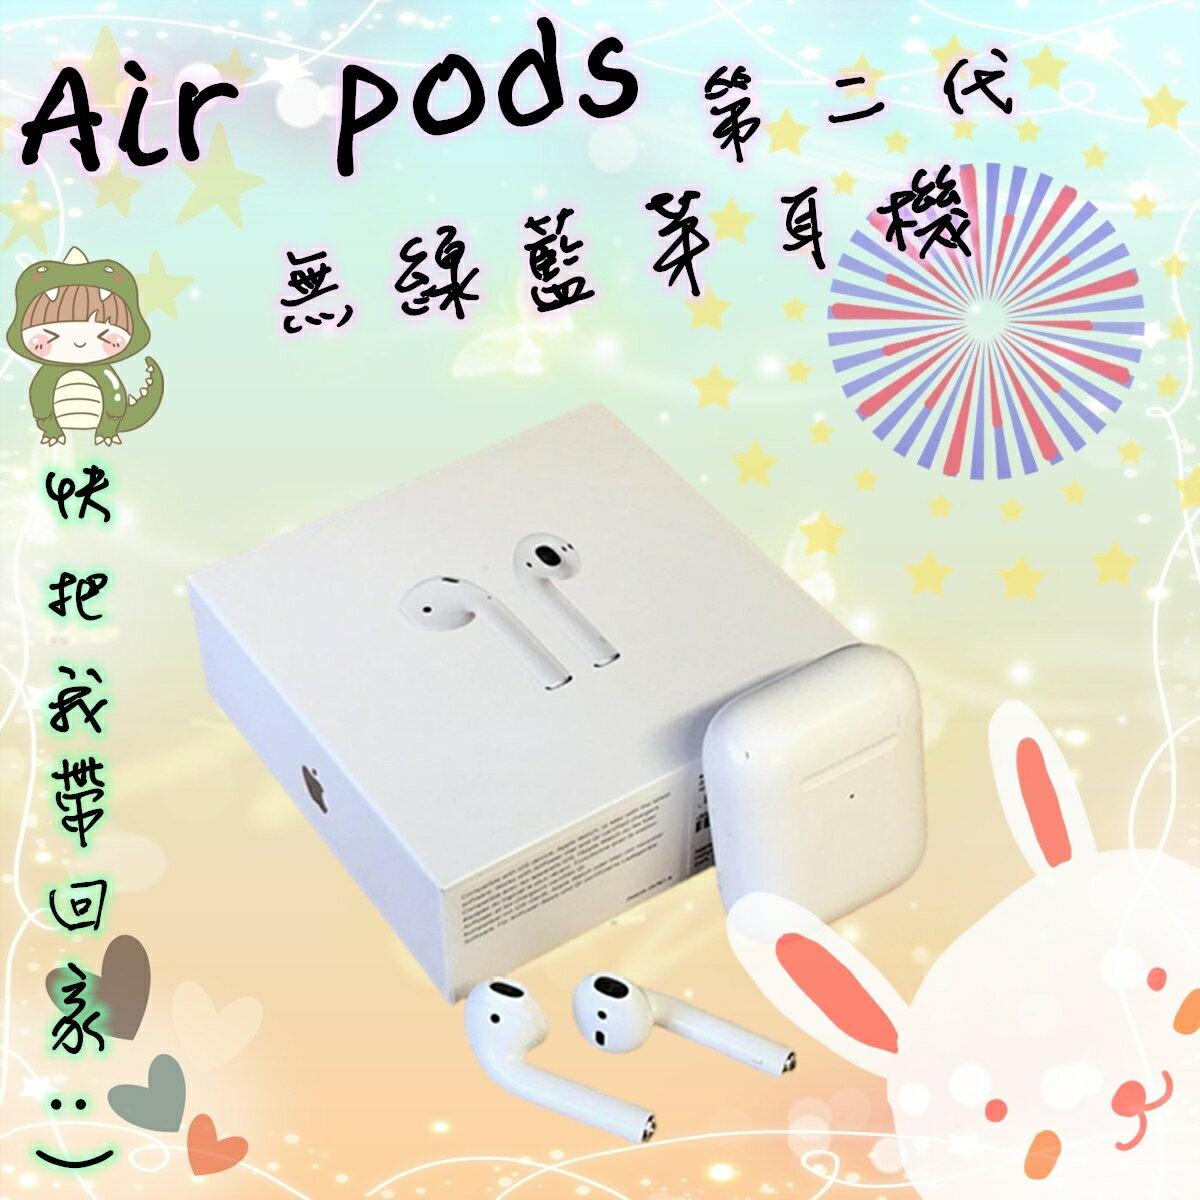 Apple Airpods 2 有線充電版 Apple 原廠無線藍芽耳機 全新未拆公司貨 保固一年 0